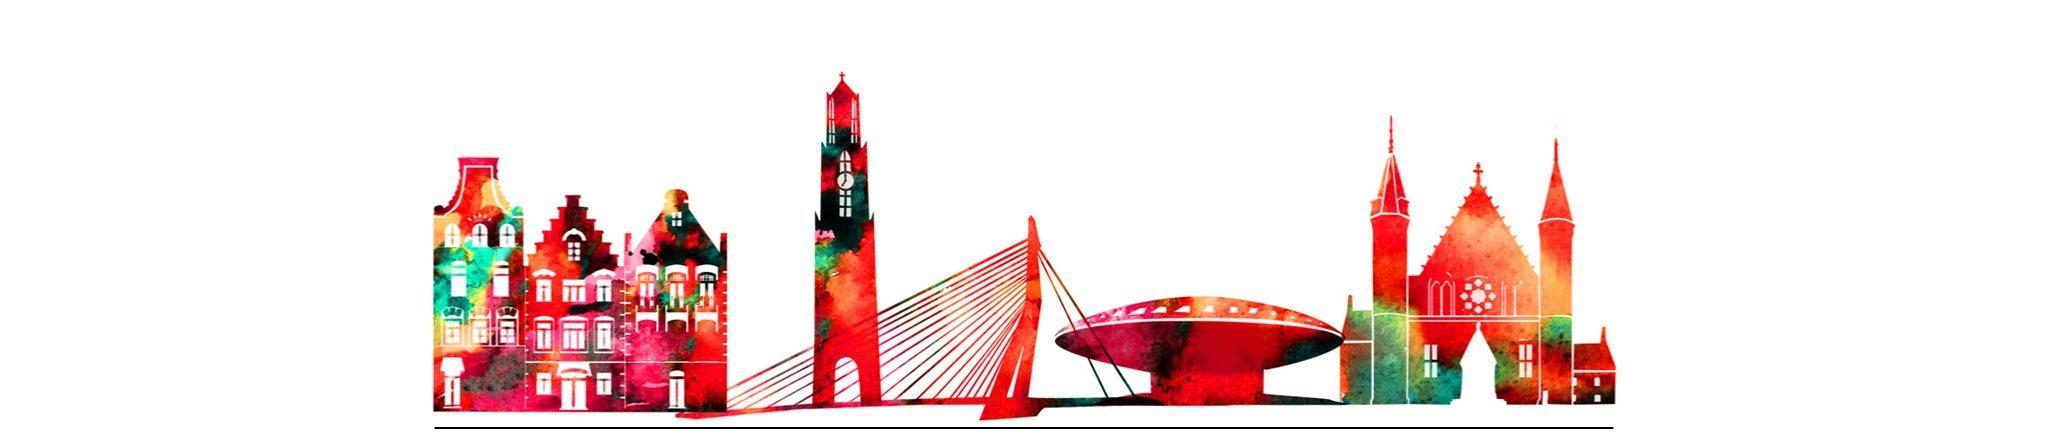 Cursus Grafisch ontwerp Art City